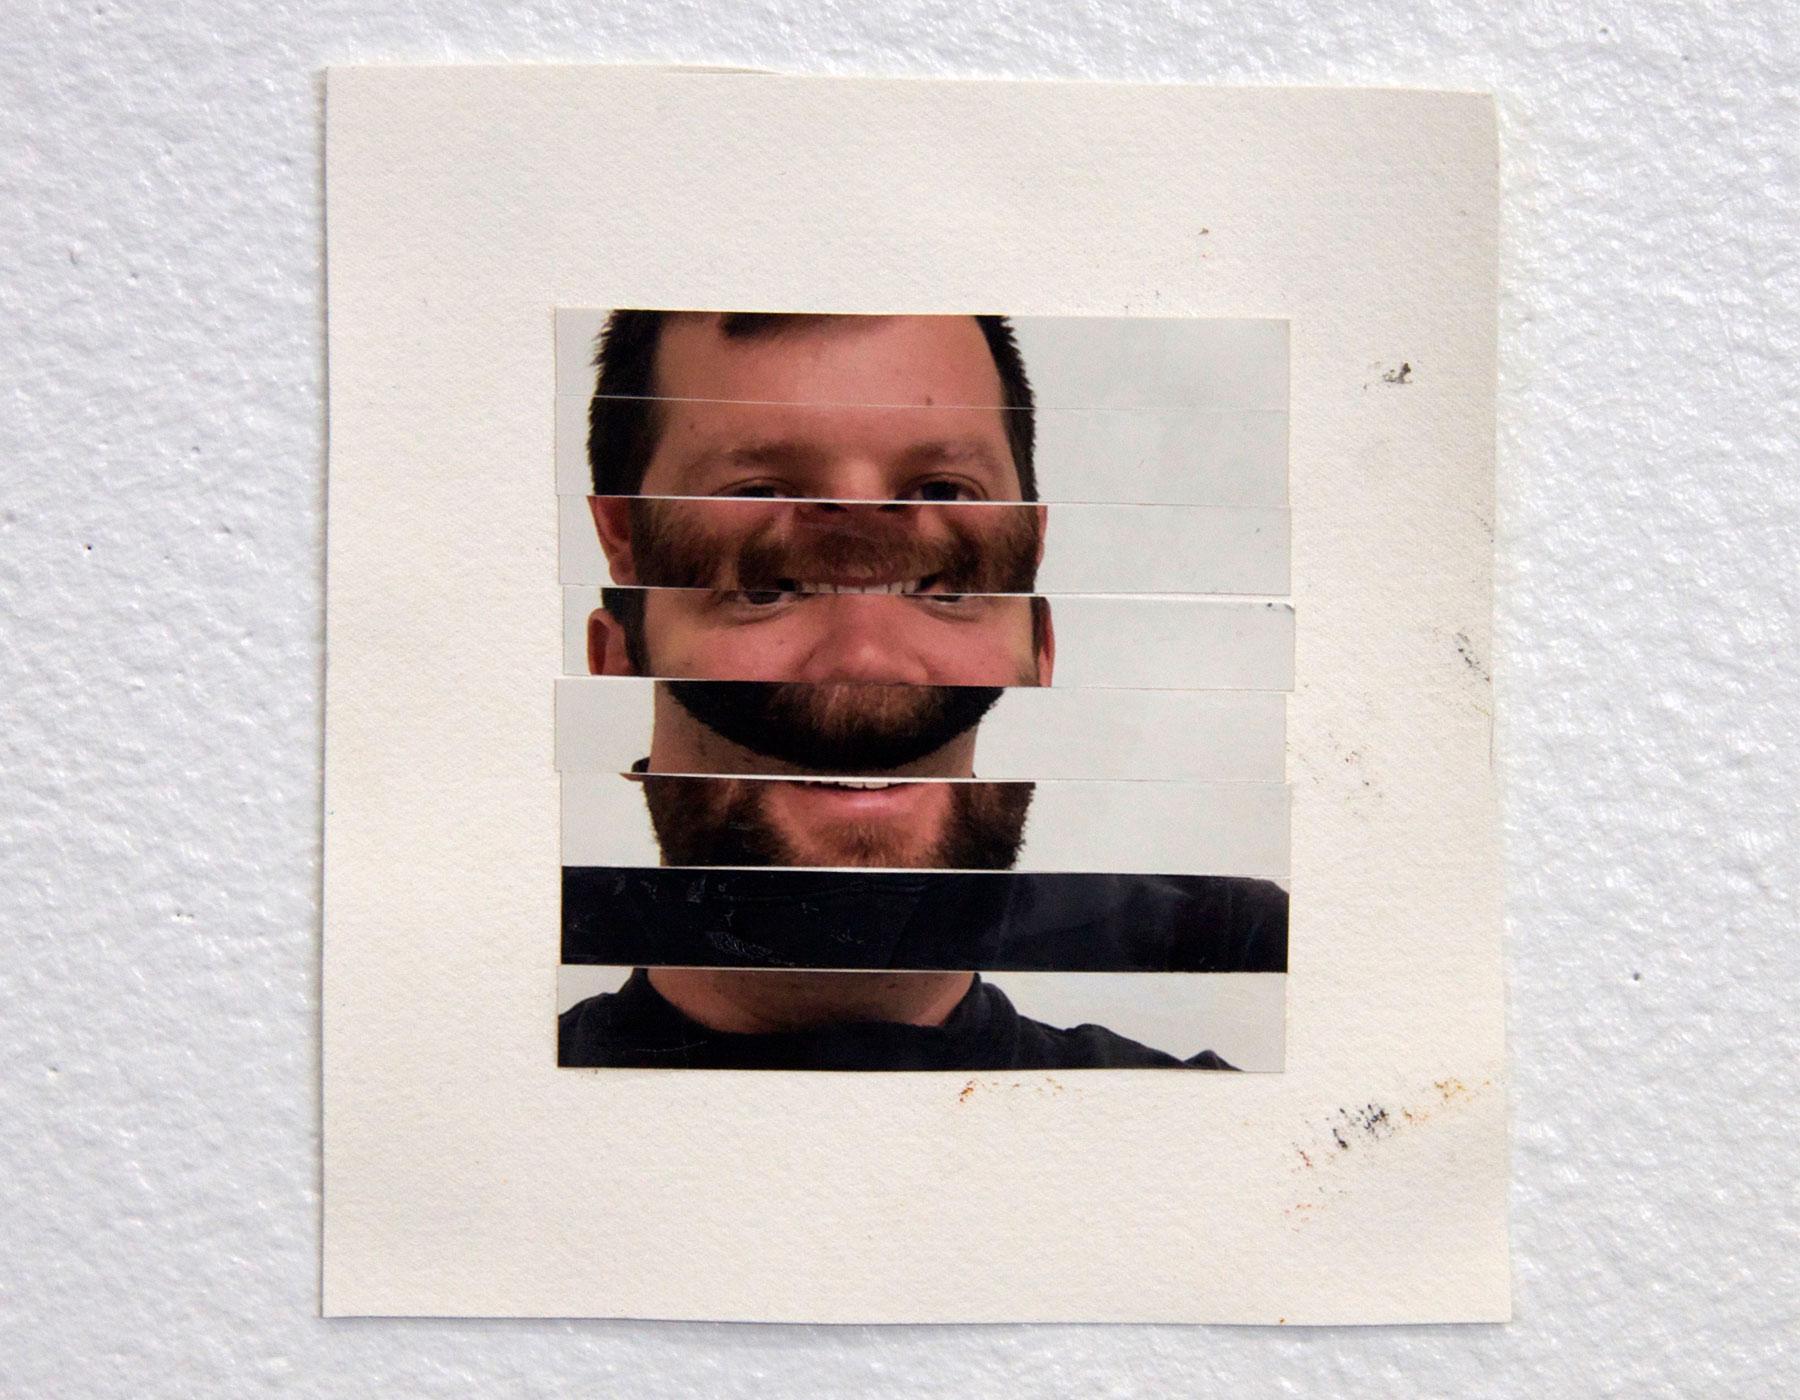 Self-Portrait (A Crack Up)